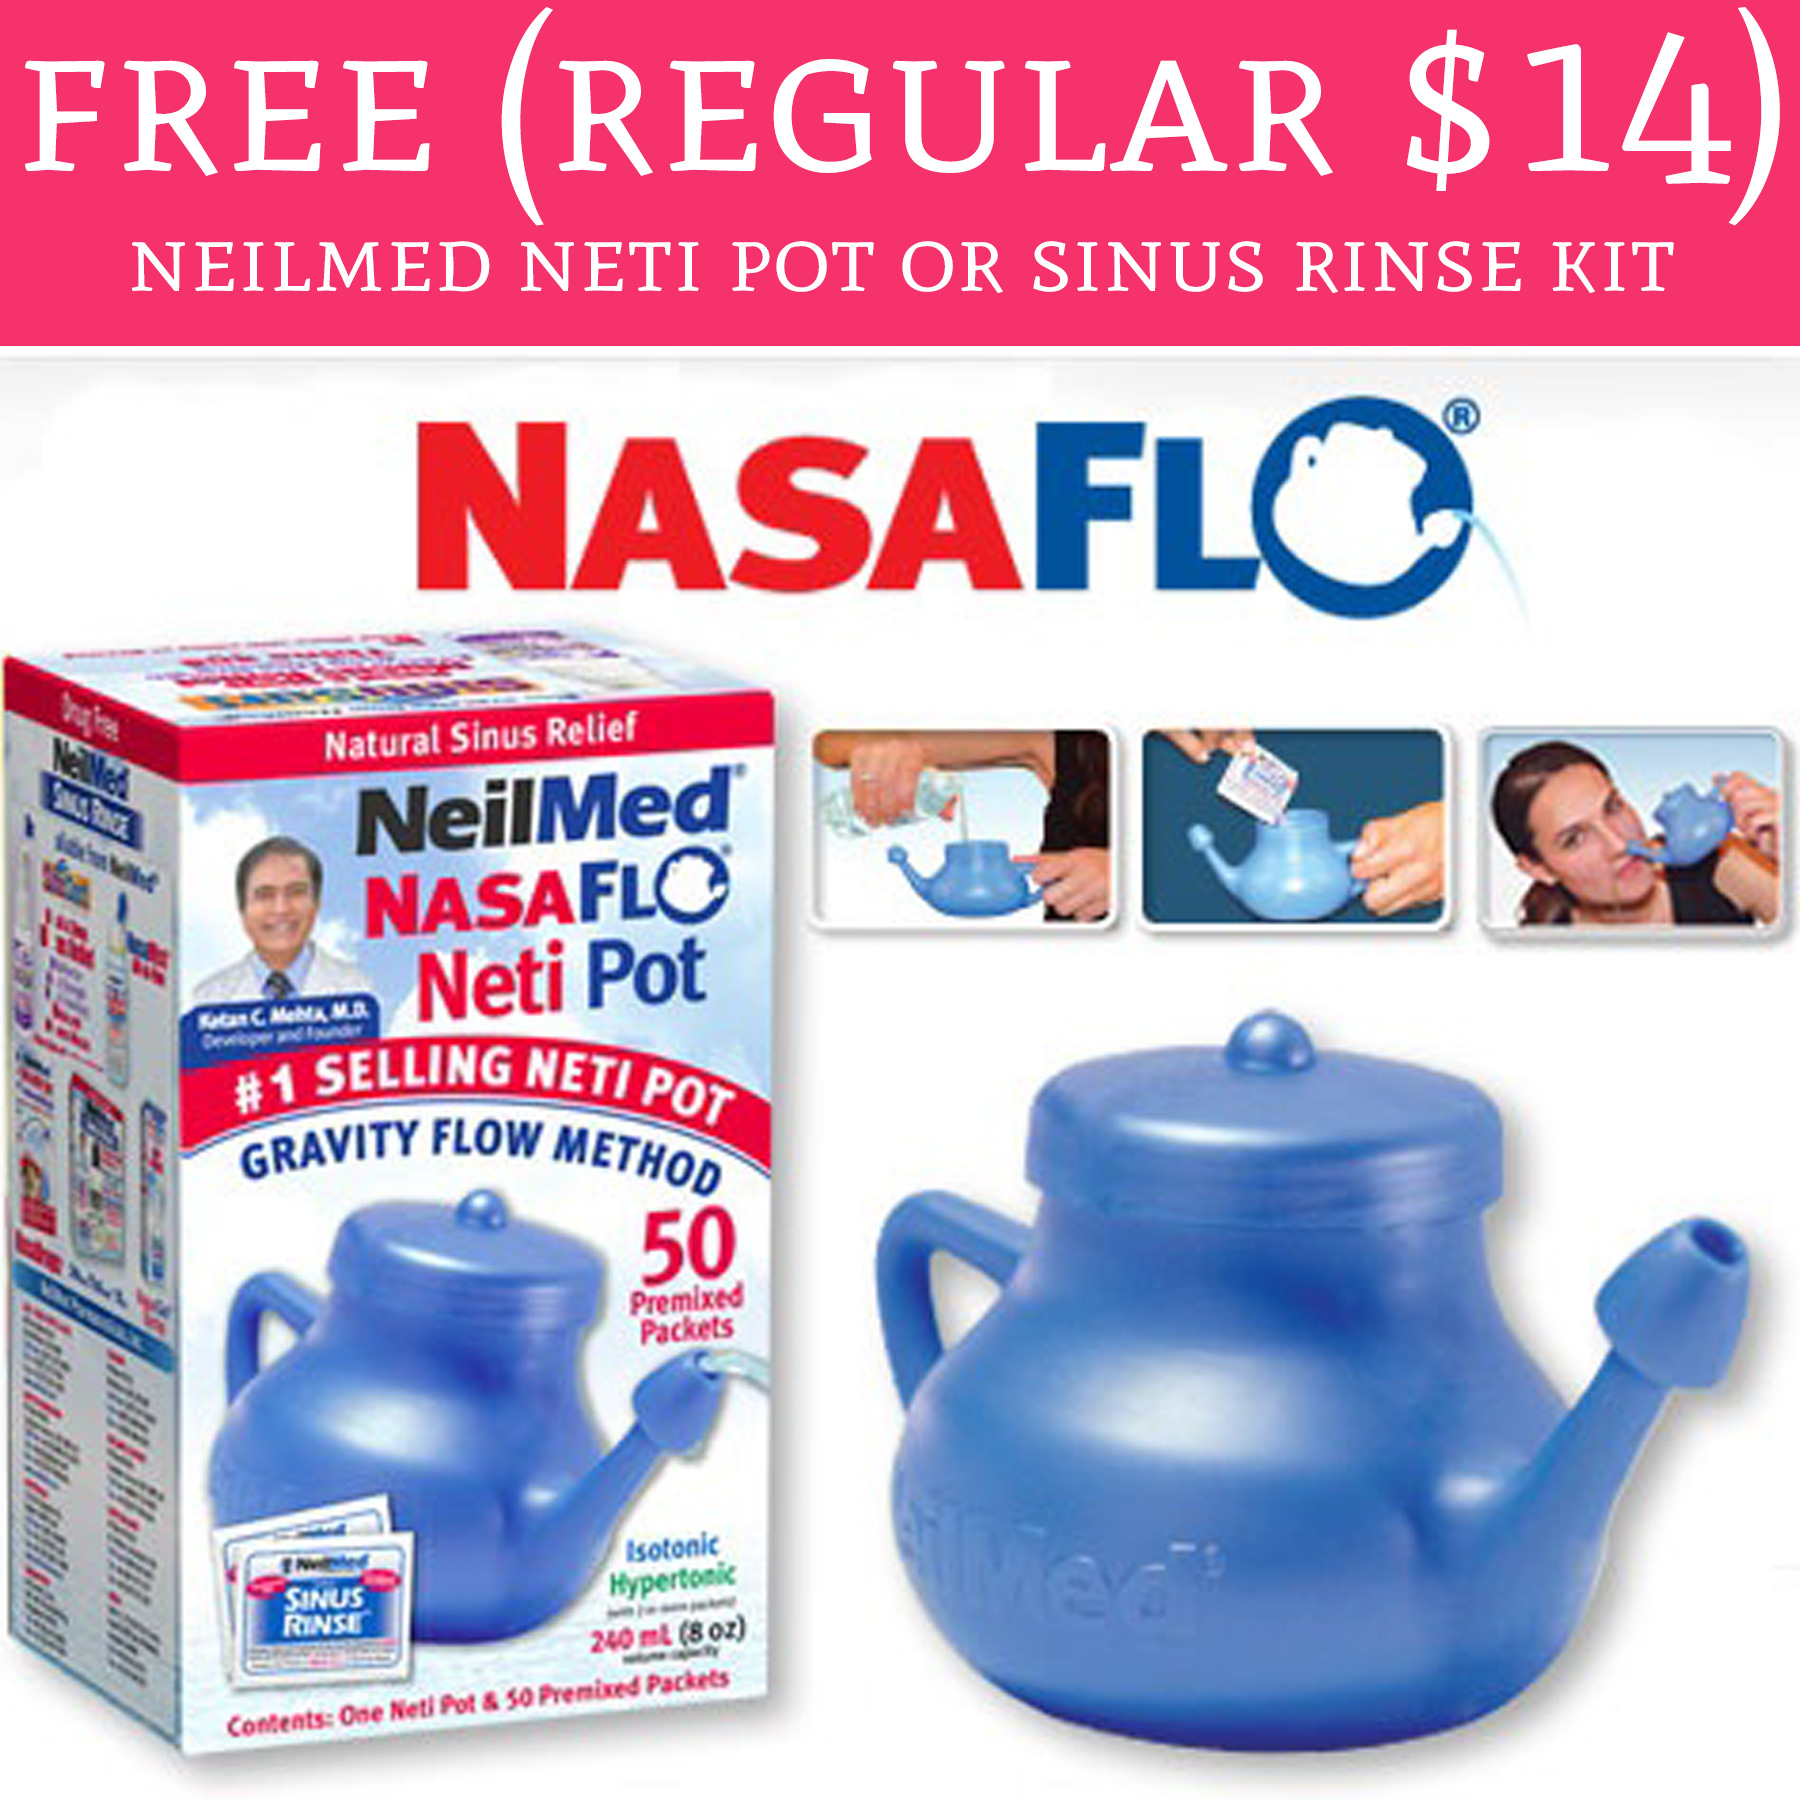 Hot Free Regular 14 Neilmed Neti Pot Or Sinuse Rinse -7760